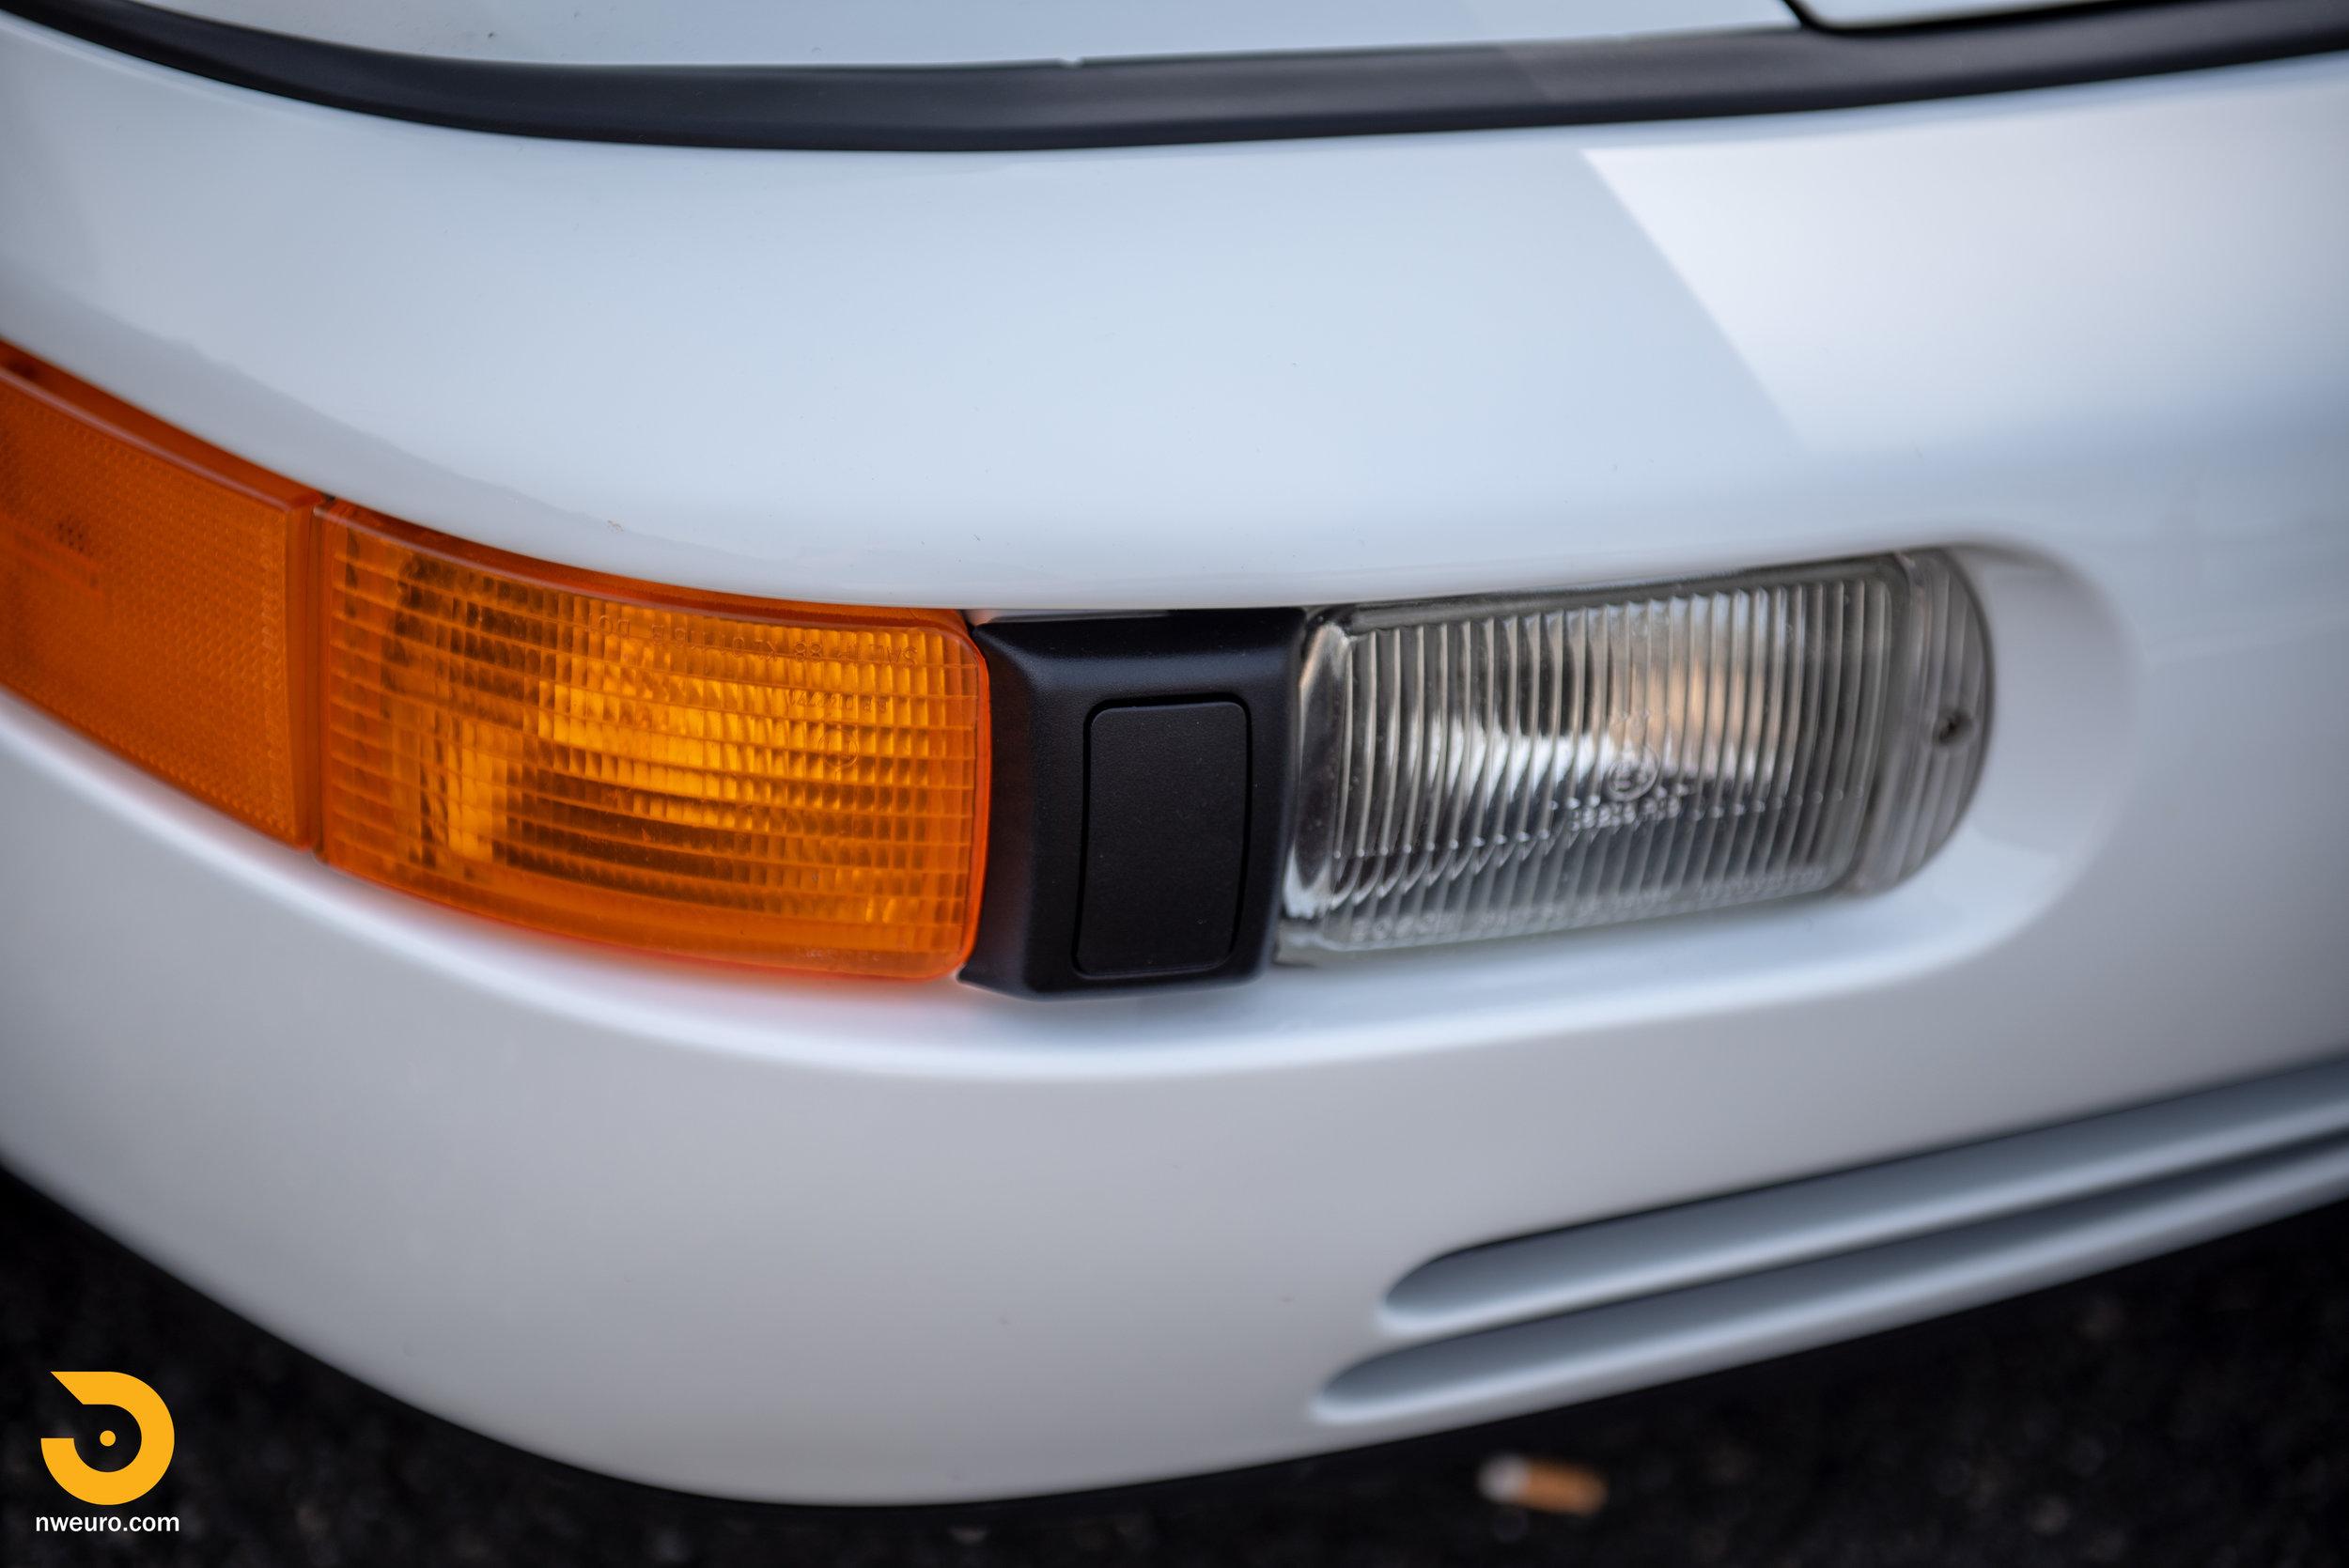 1993 Porsche RS America White-4.jpg